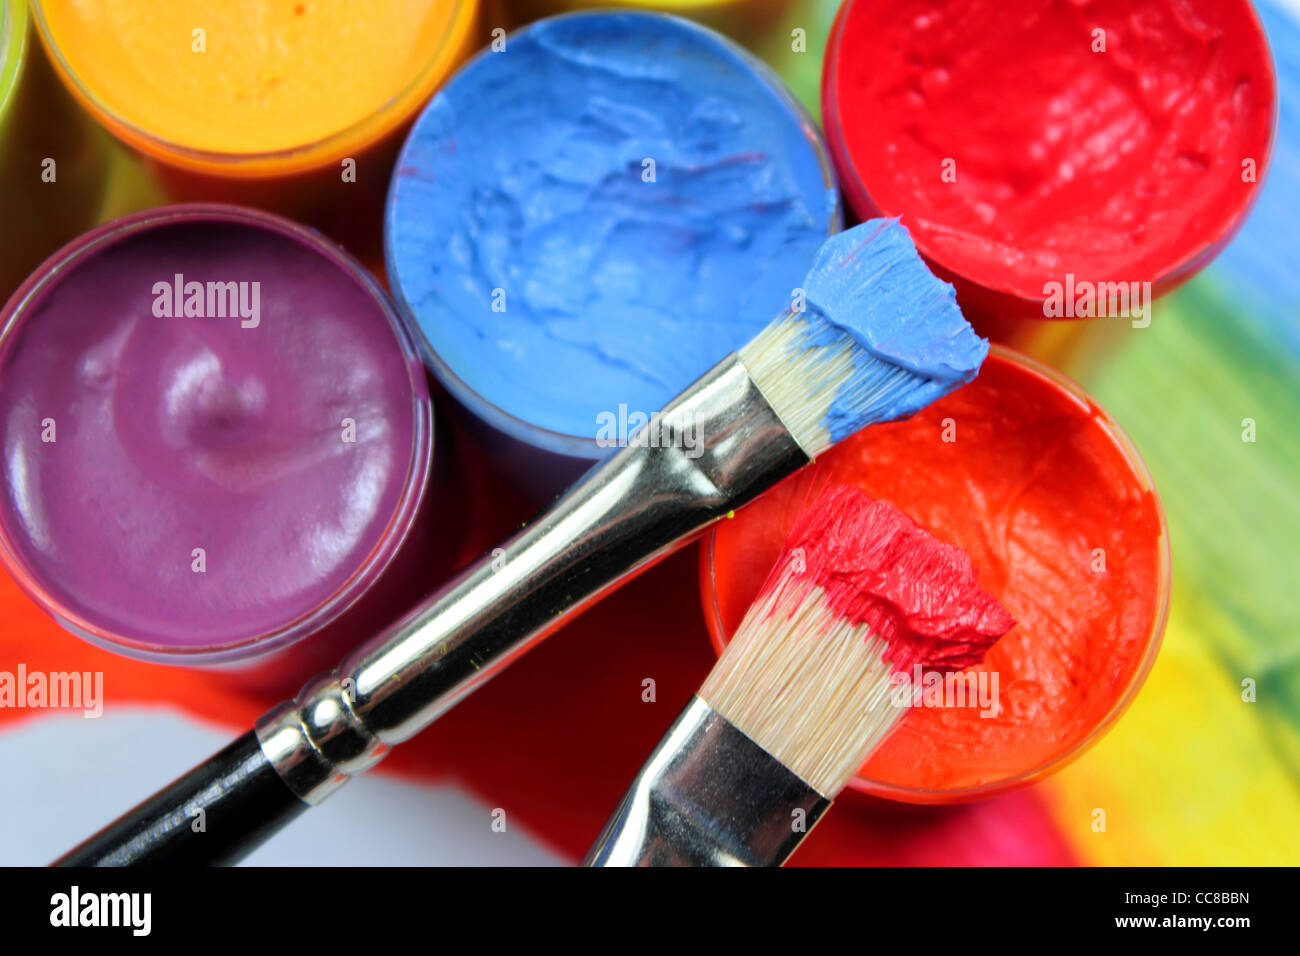 Paint brushes on opened paint bucket - Stock Image